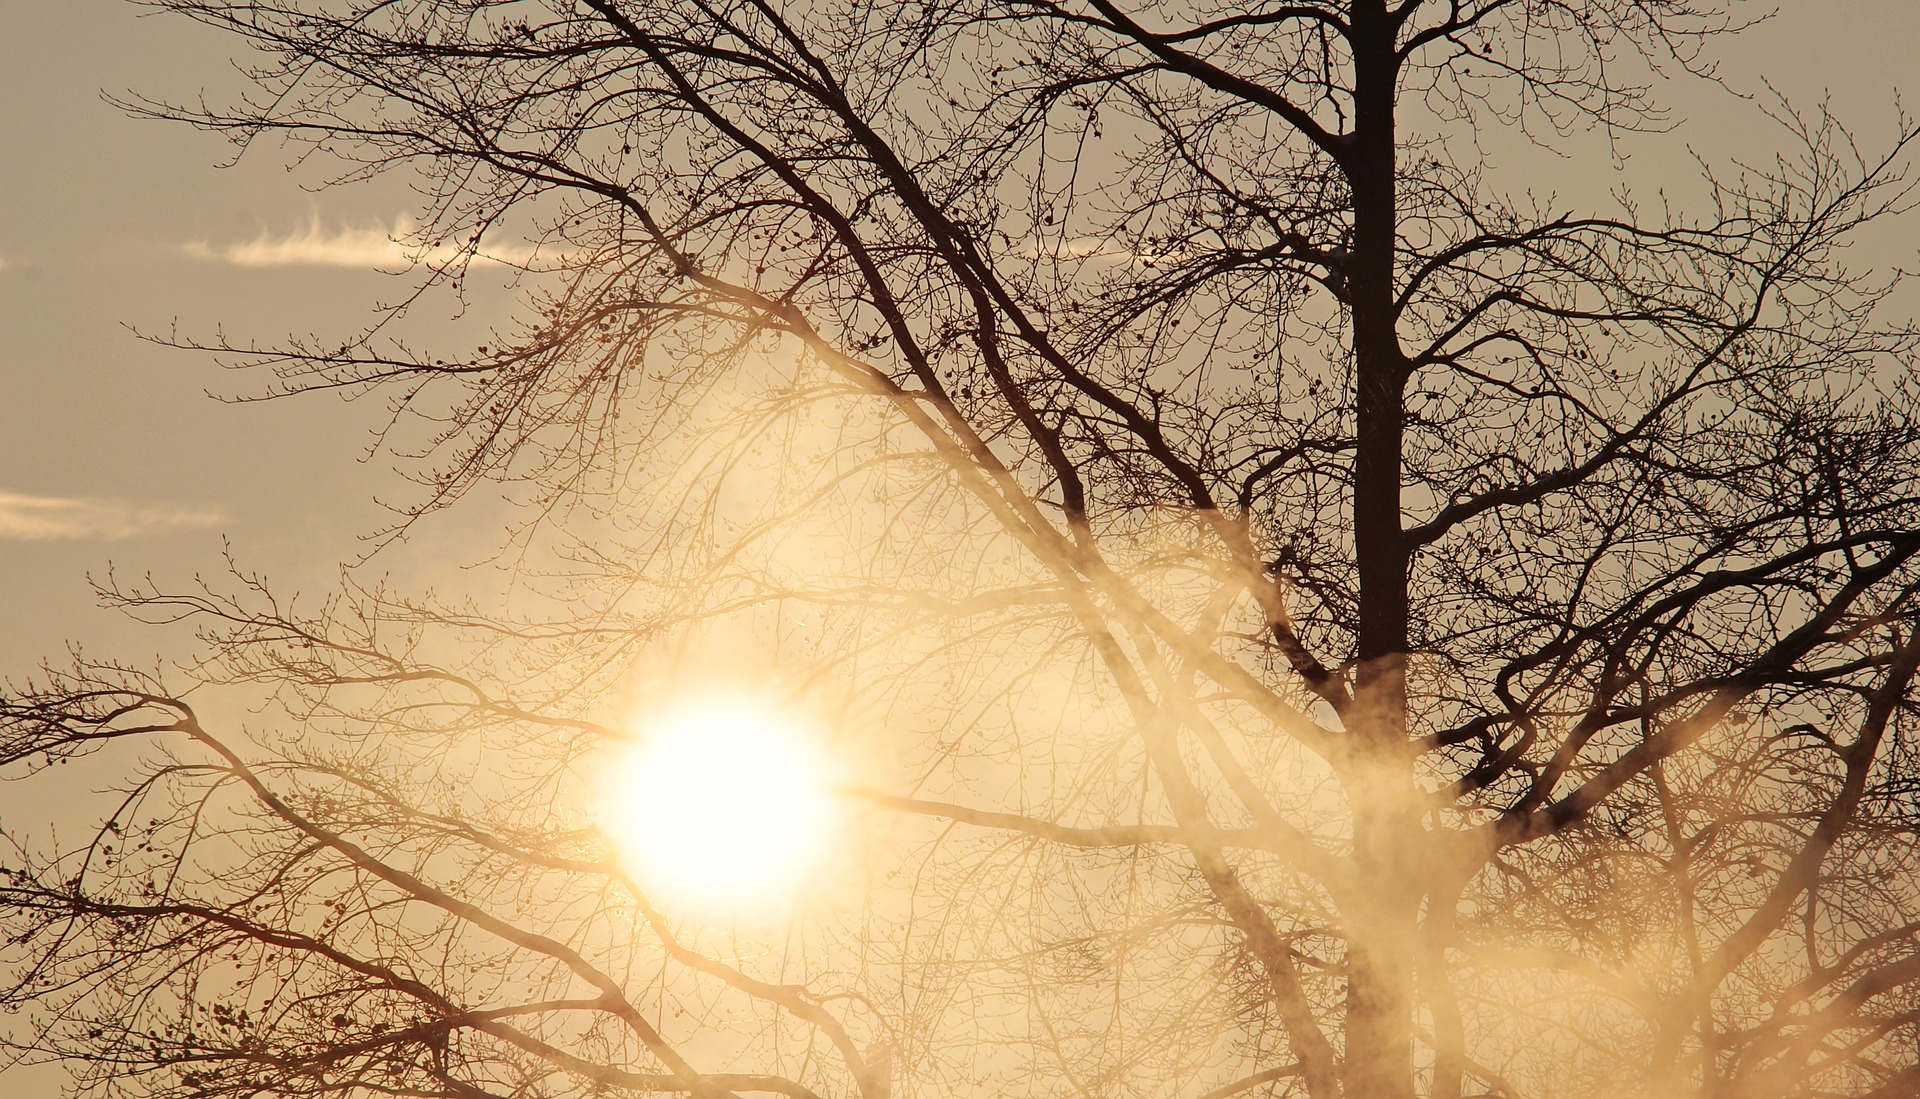 opgaande zon